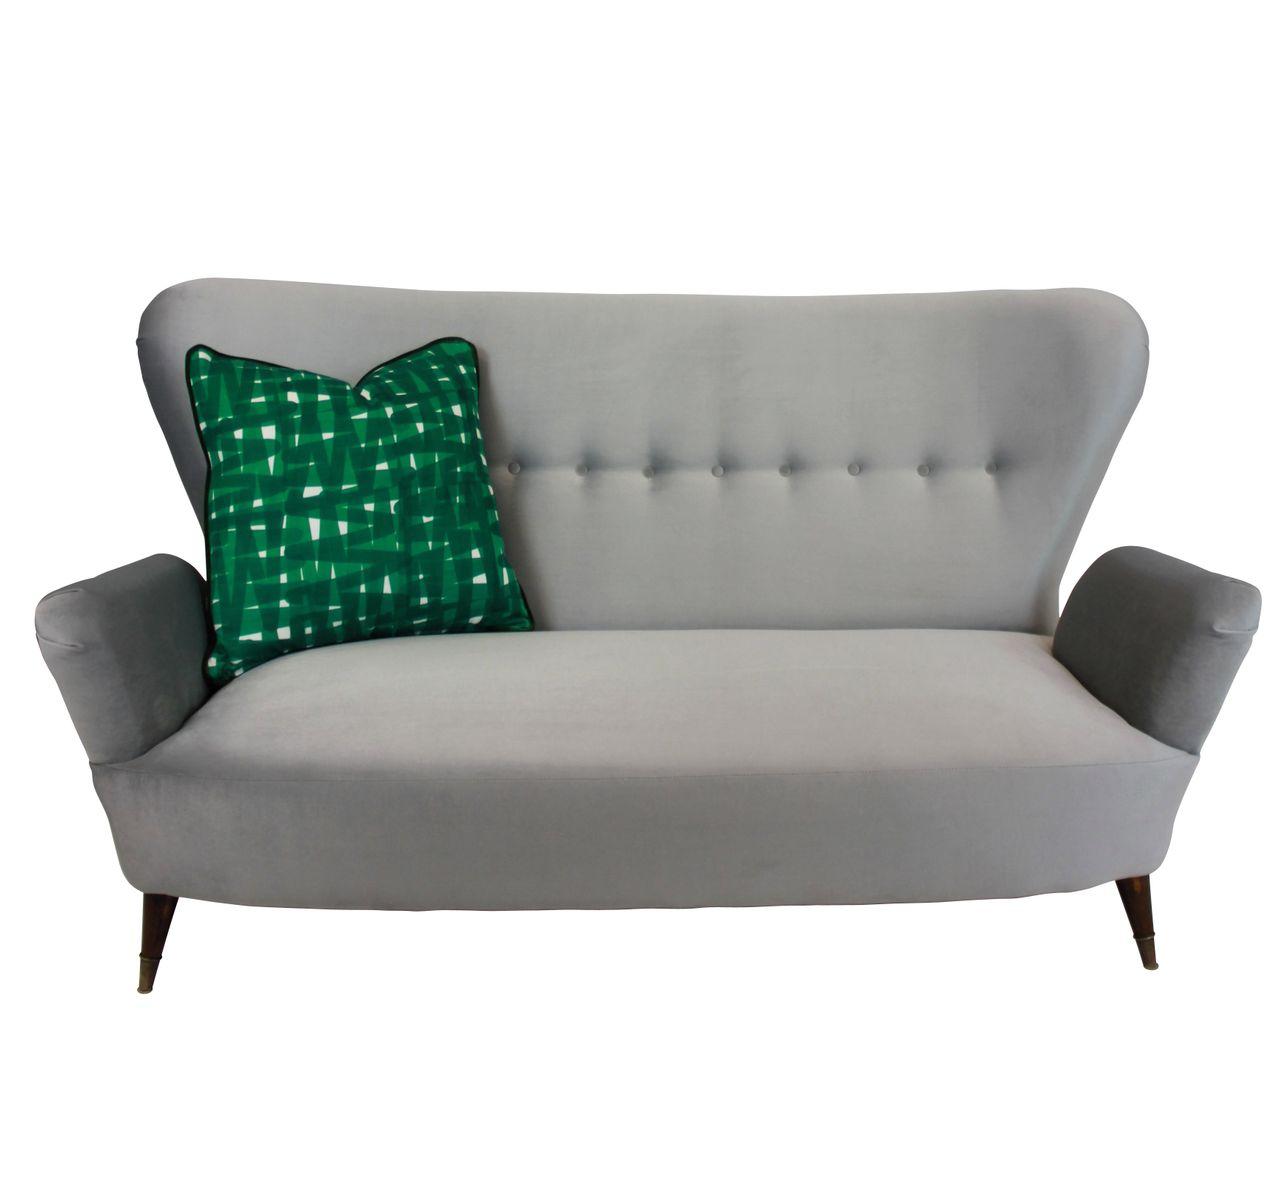 mid century italian sofa bei pamono kaufen. Black Bedroom Furniture Sets. Home Design Ideas